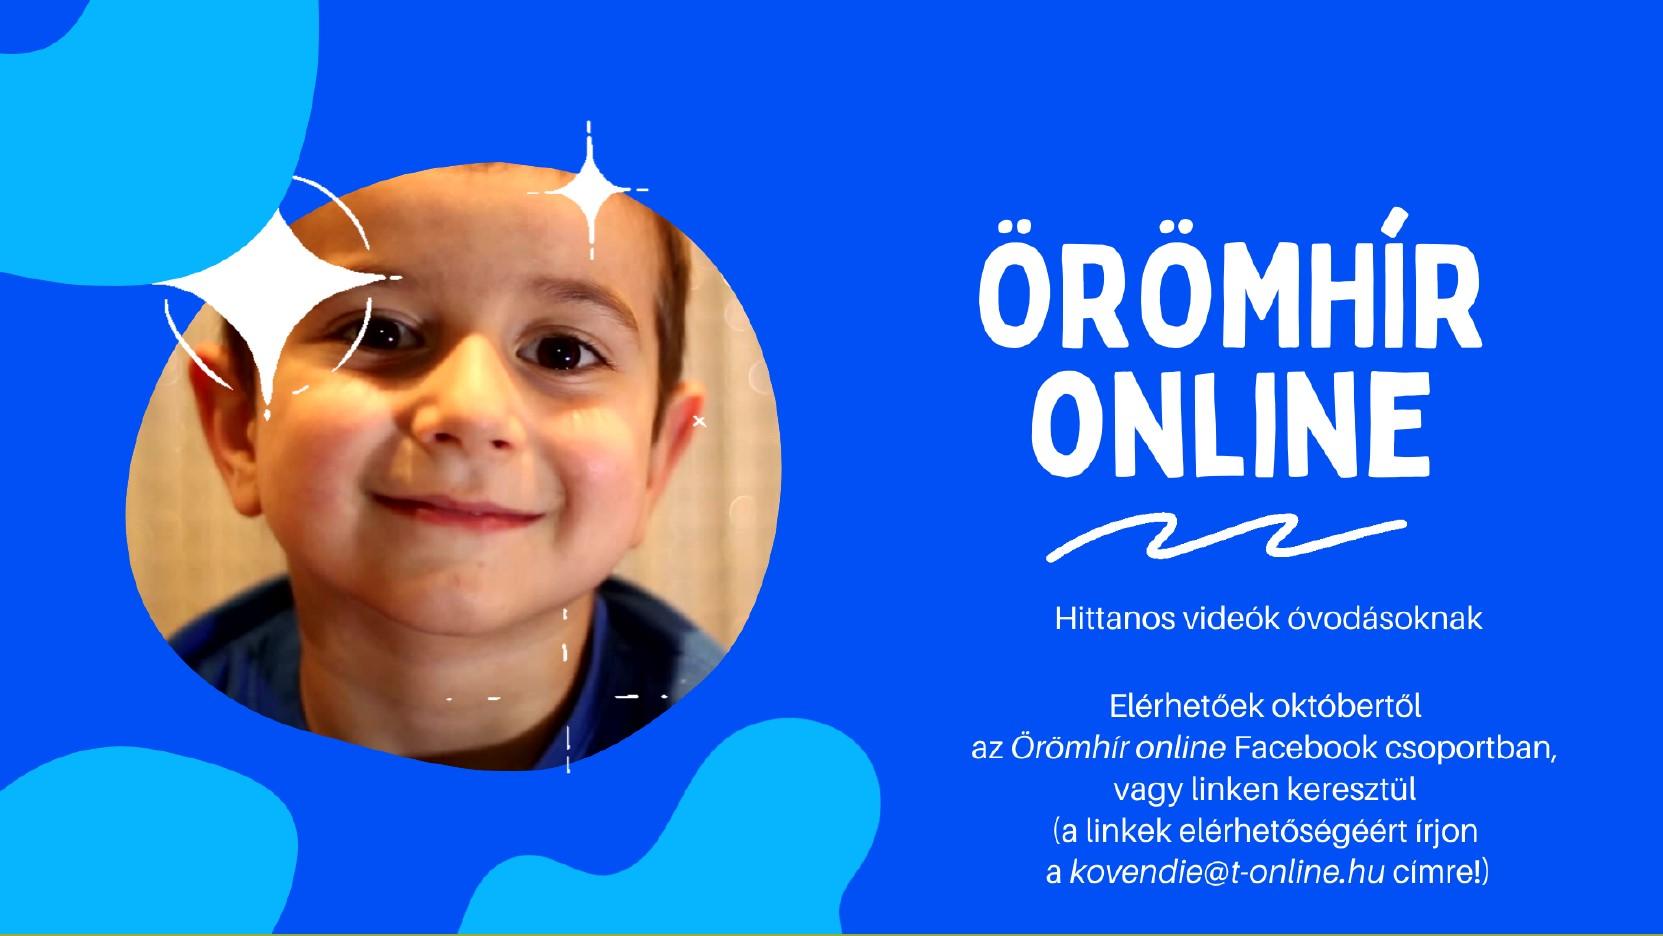 Oromhir online